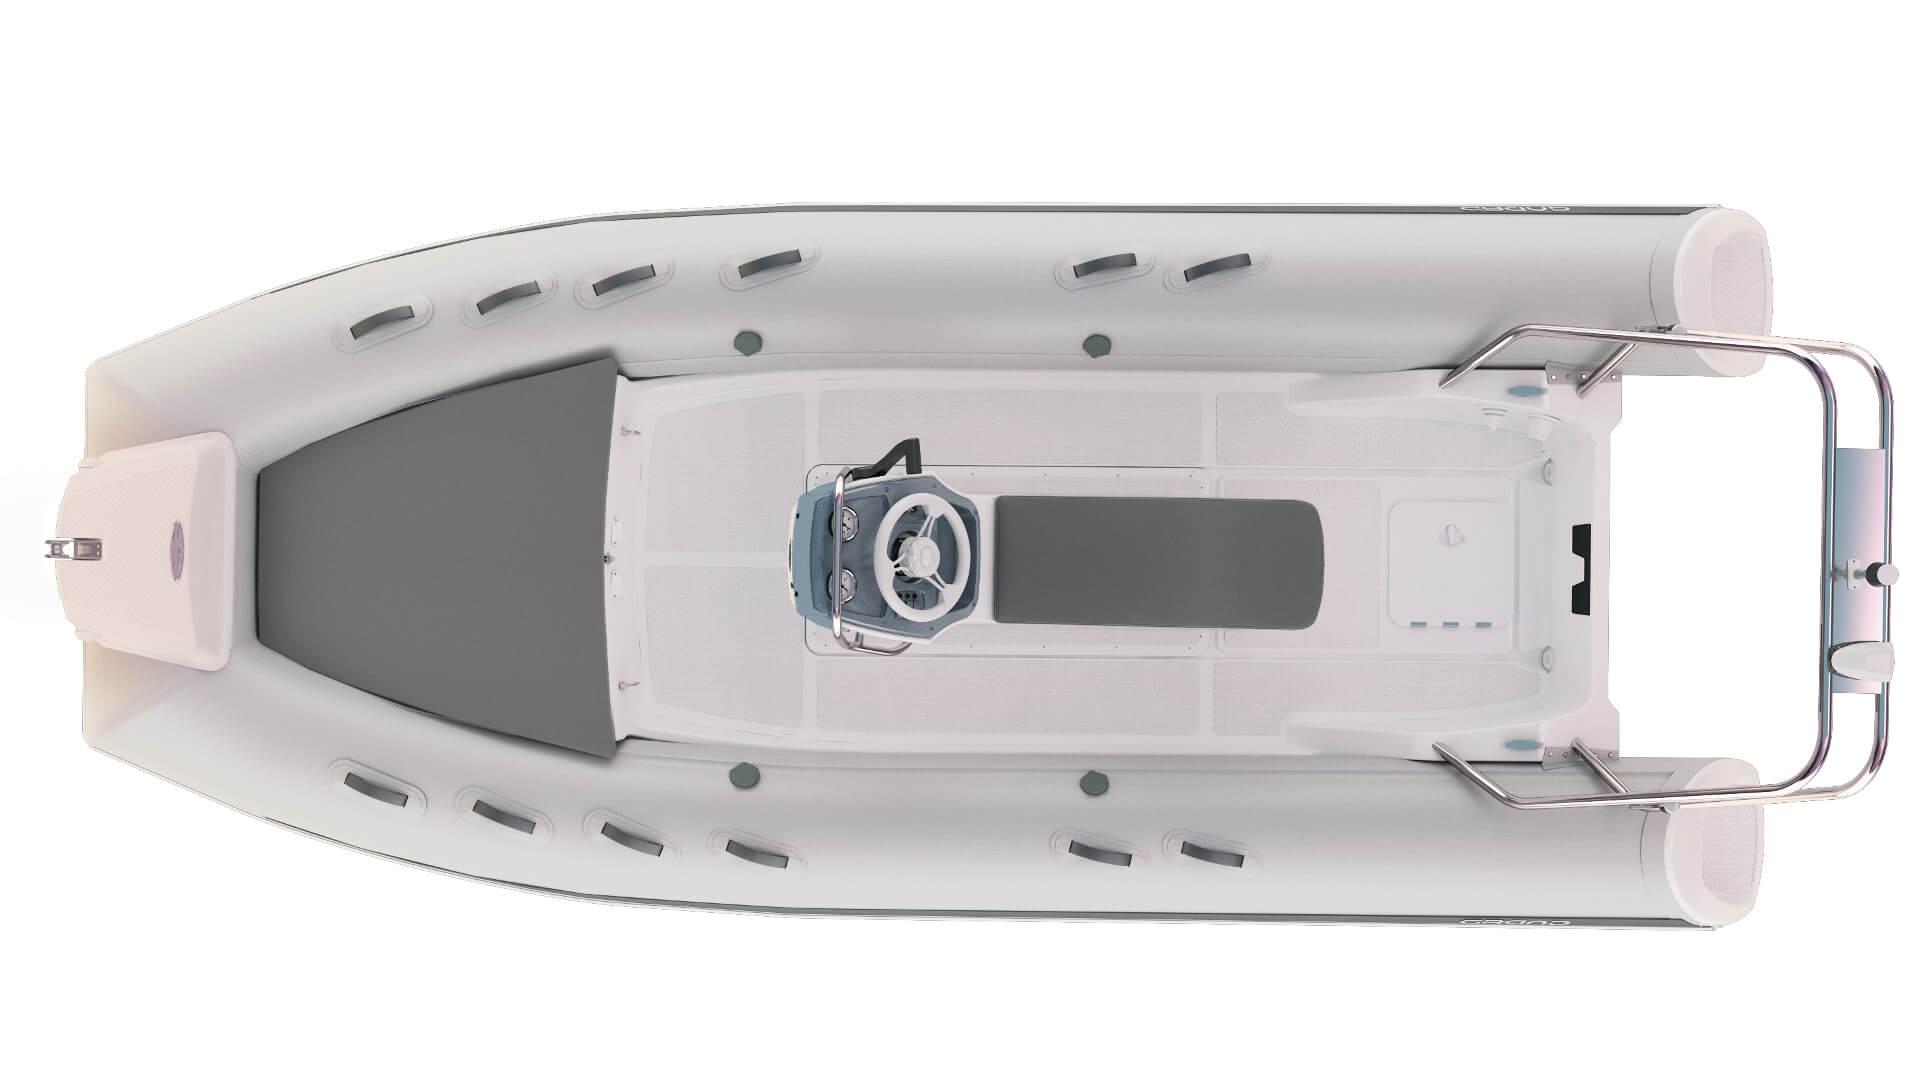 Надувная лодка с жестким дном GRAND Silver Line S520S, Надувная лодка GRAND Silver Line S520SF, GRAND Silver Line S520S, GRAND Silver Line S520SF, GRAND S520S, GRAND S520SF, GRAND S520, Надувная лодка GRAND, Надувная лодка ГРАНД, Надувная лодка с жестким дном, RIB, Rigid Inflatable Boats